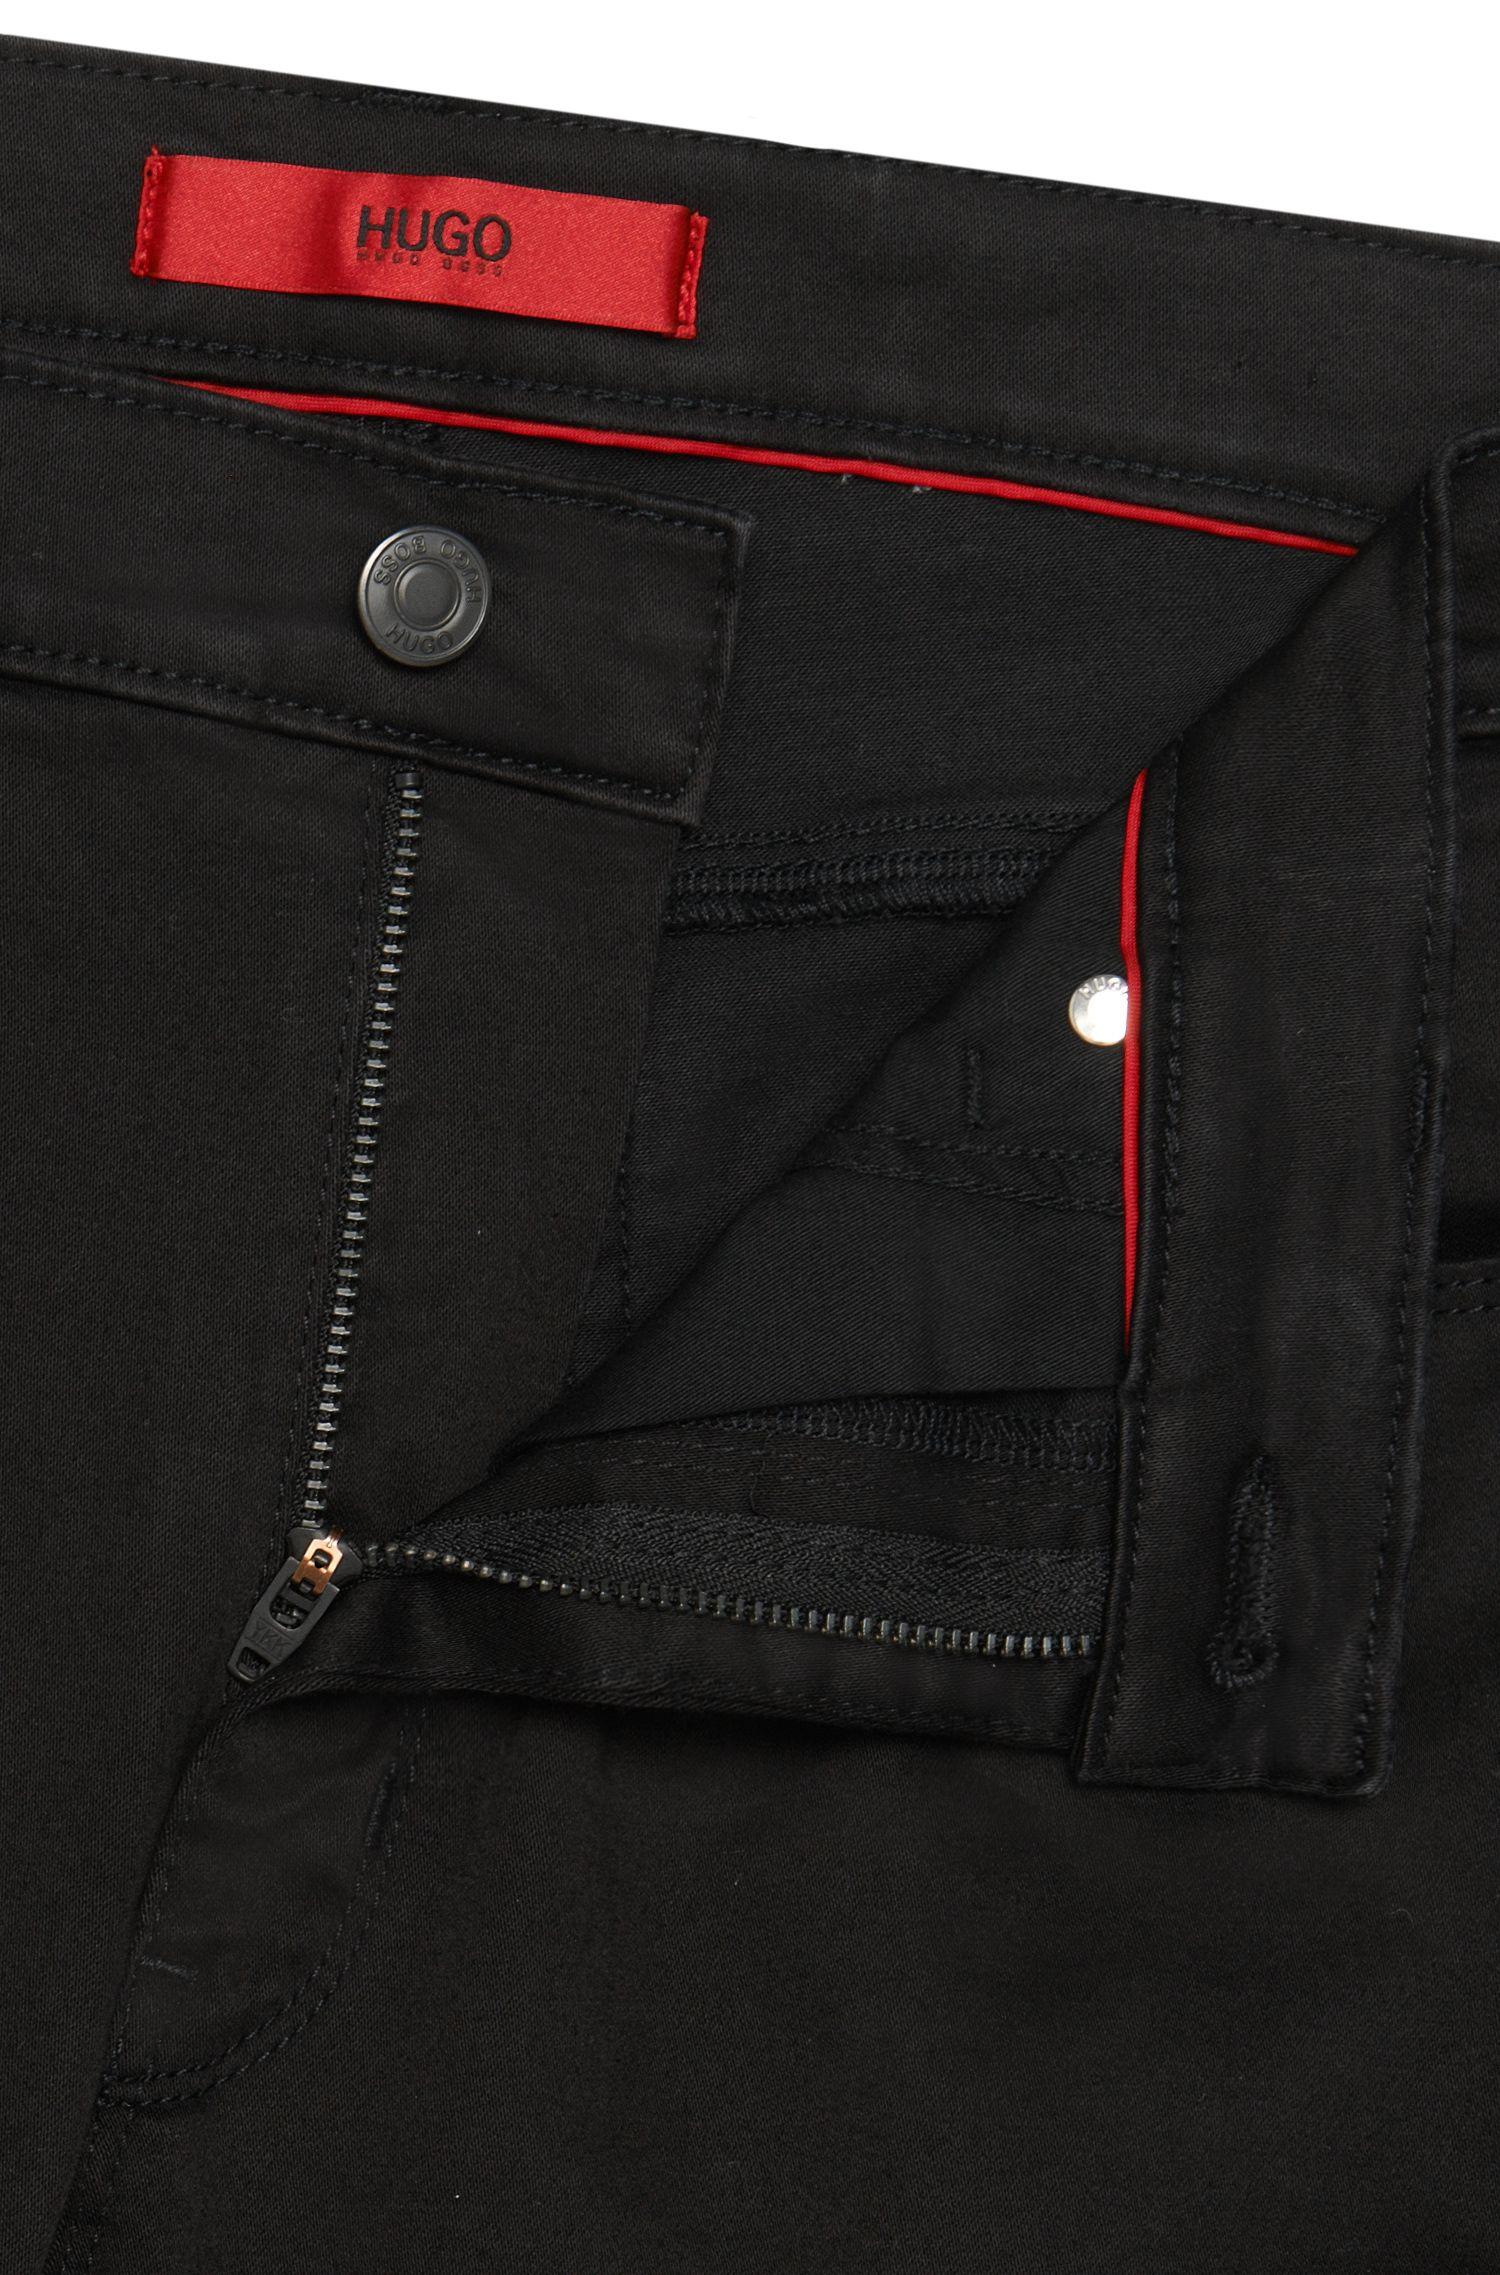 Unifarbene Skinny-Fit Jeans aus elastischem Baumwoll-Mix: 'HUGO 734'